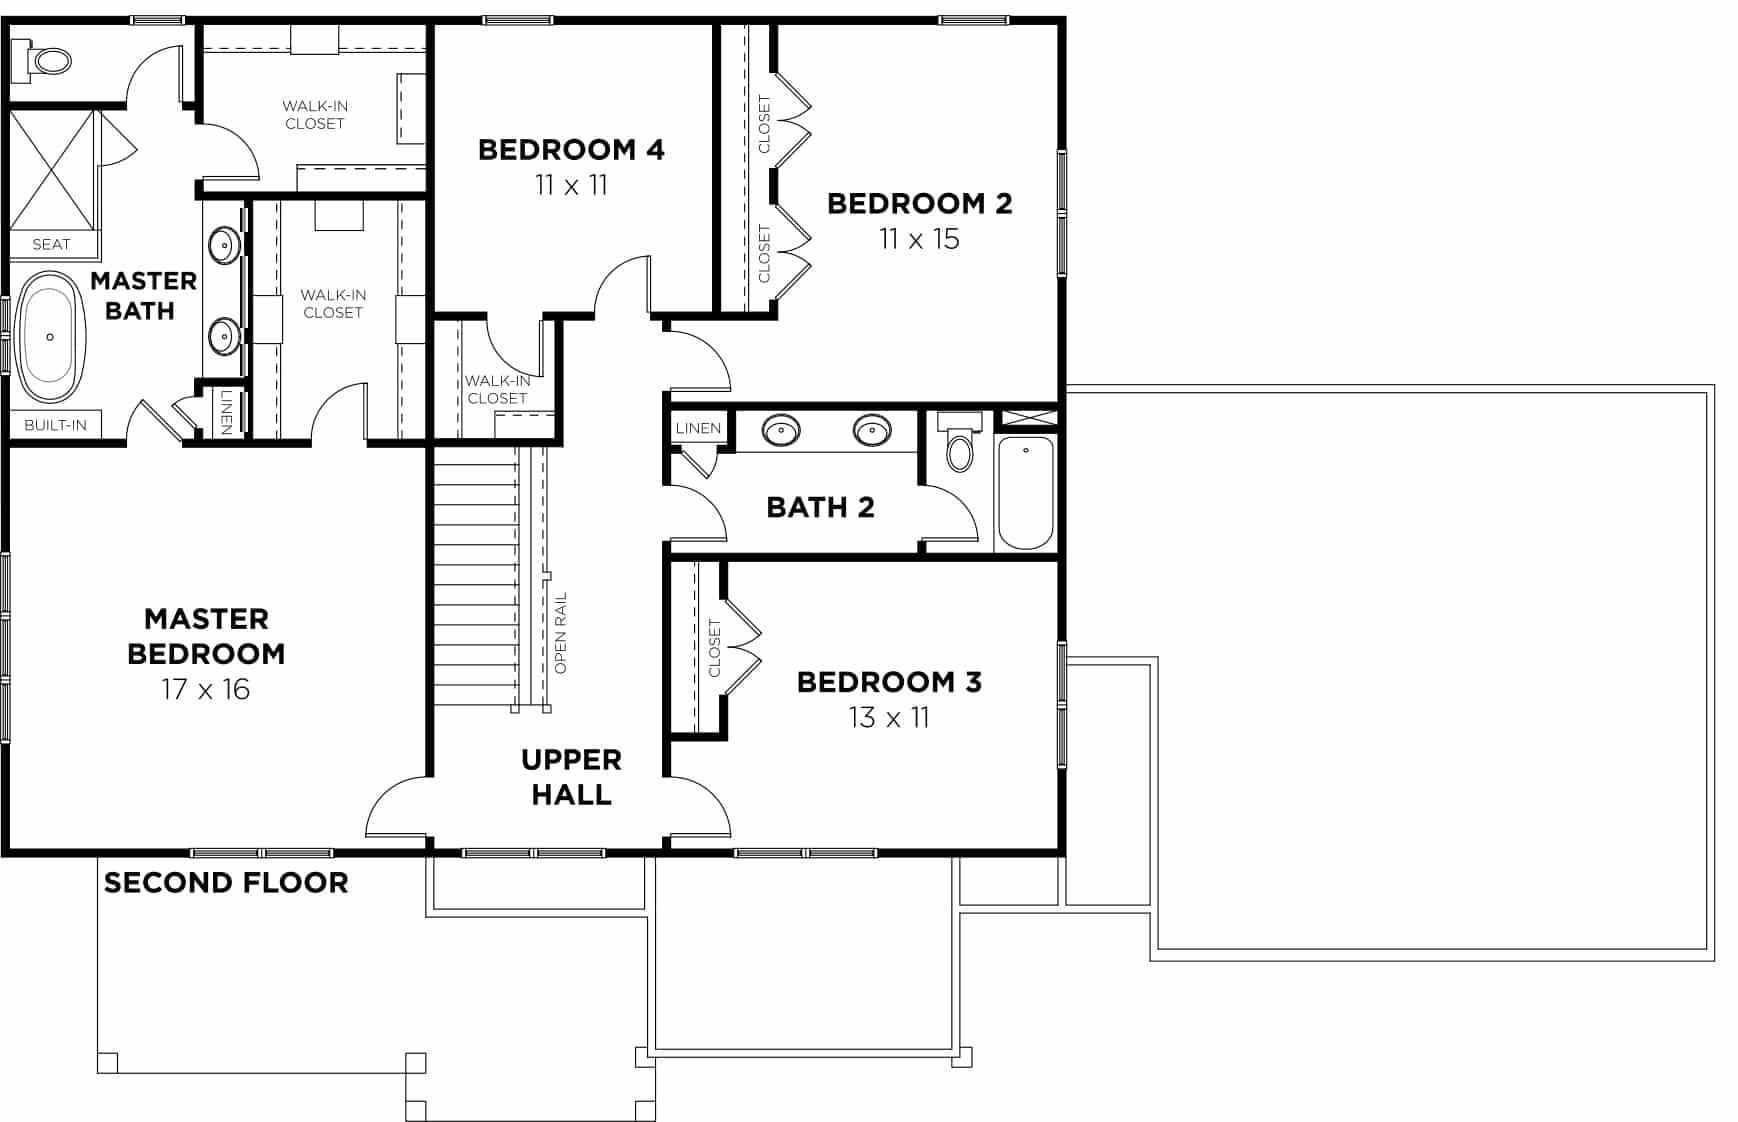 3283A-second-floor.jpg